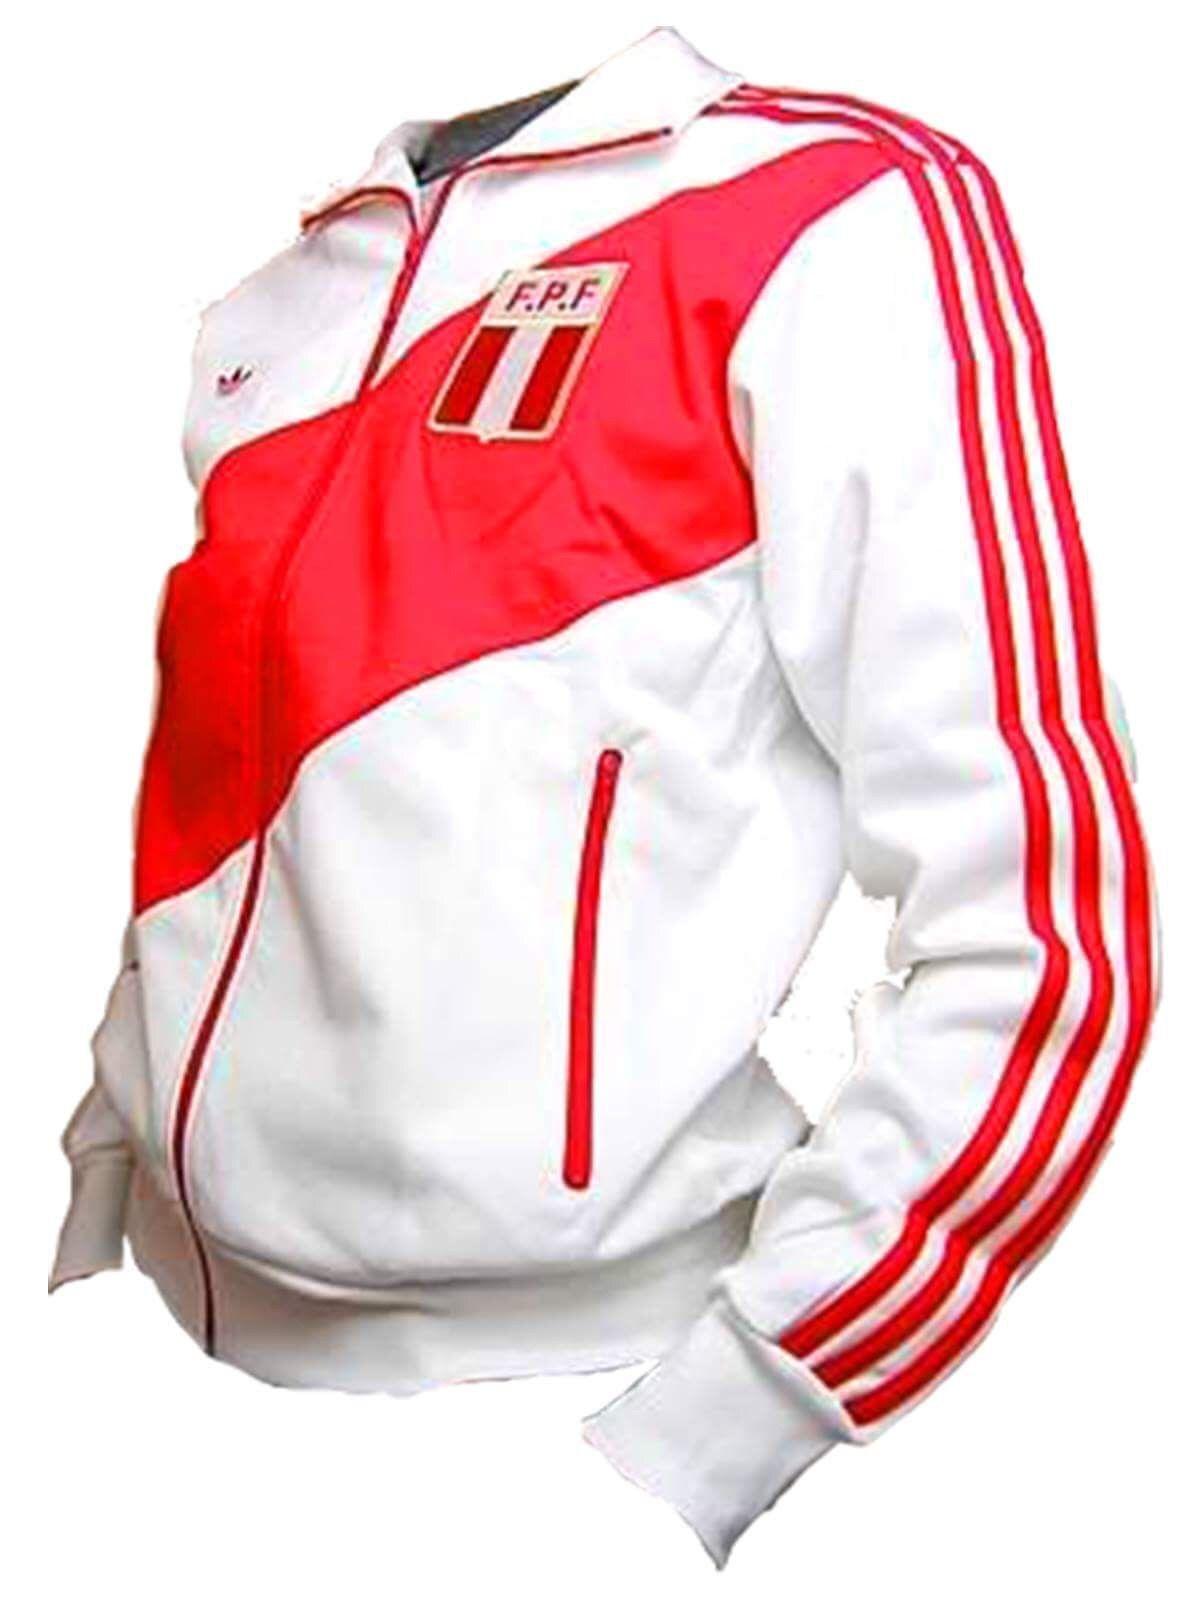 866b47fa17a Peru national team soccer jersey World Cup Argentina 78 Peru National Team, Football  Fans,